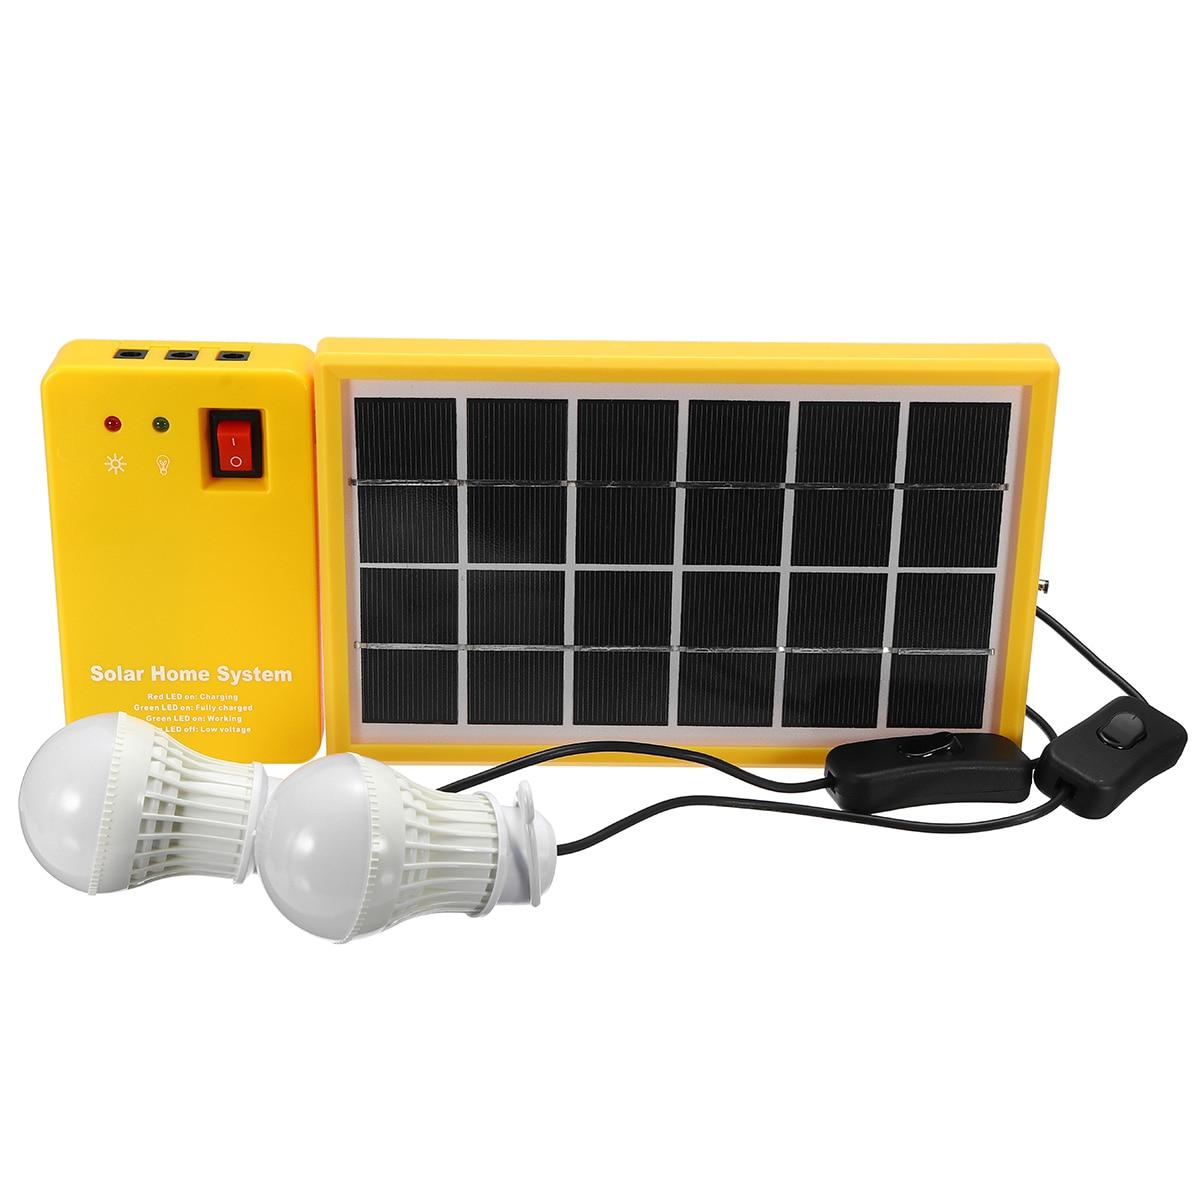 energia solar painel gerador kit com 3 03